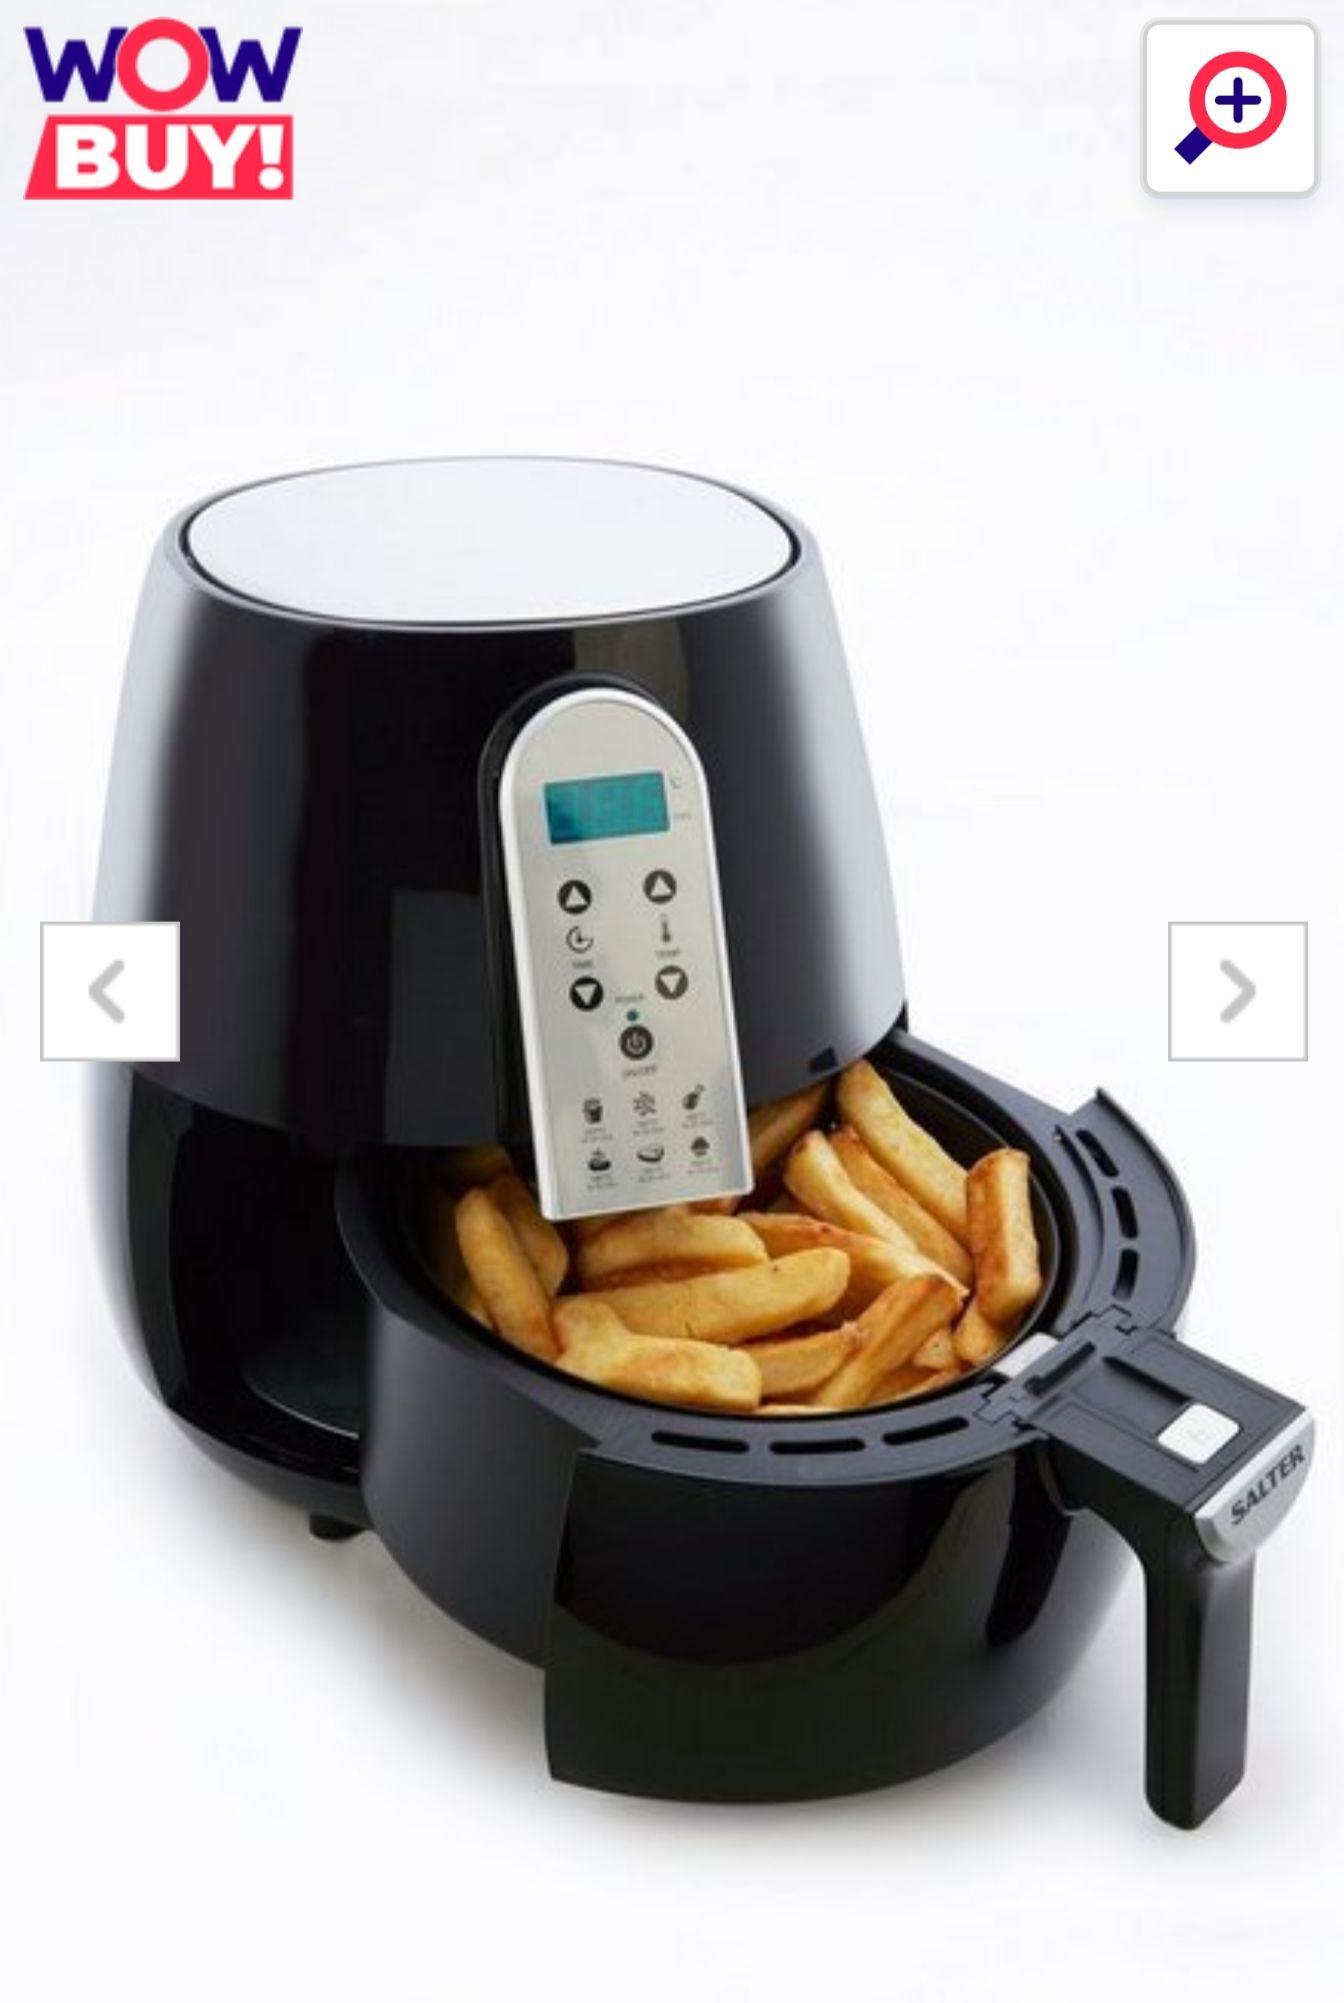 Salter XL Digital Hot Air Fryer @ Studio for £44.99